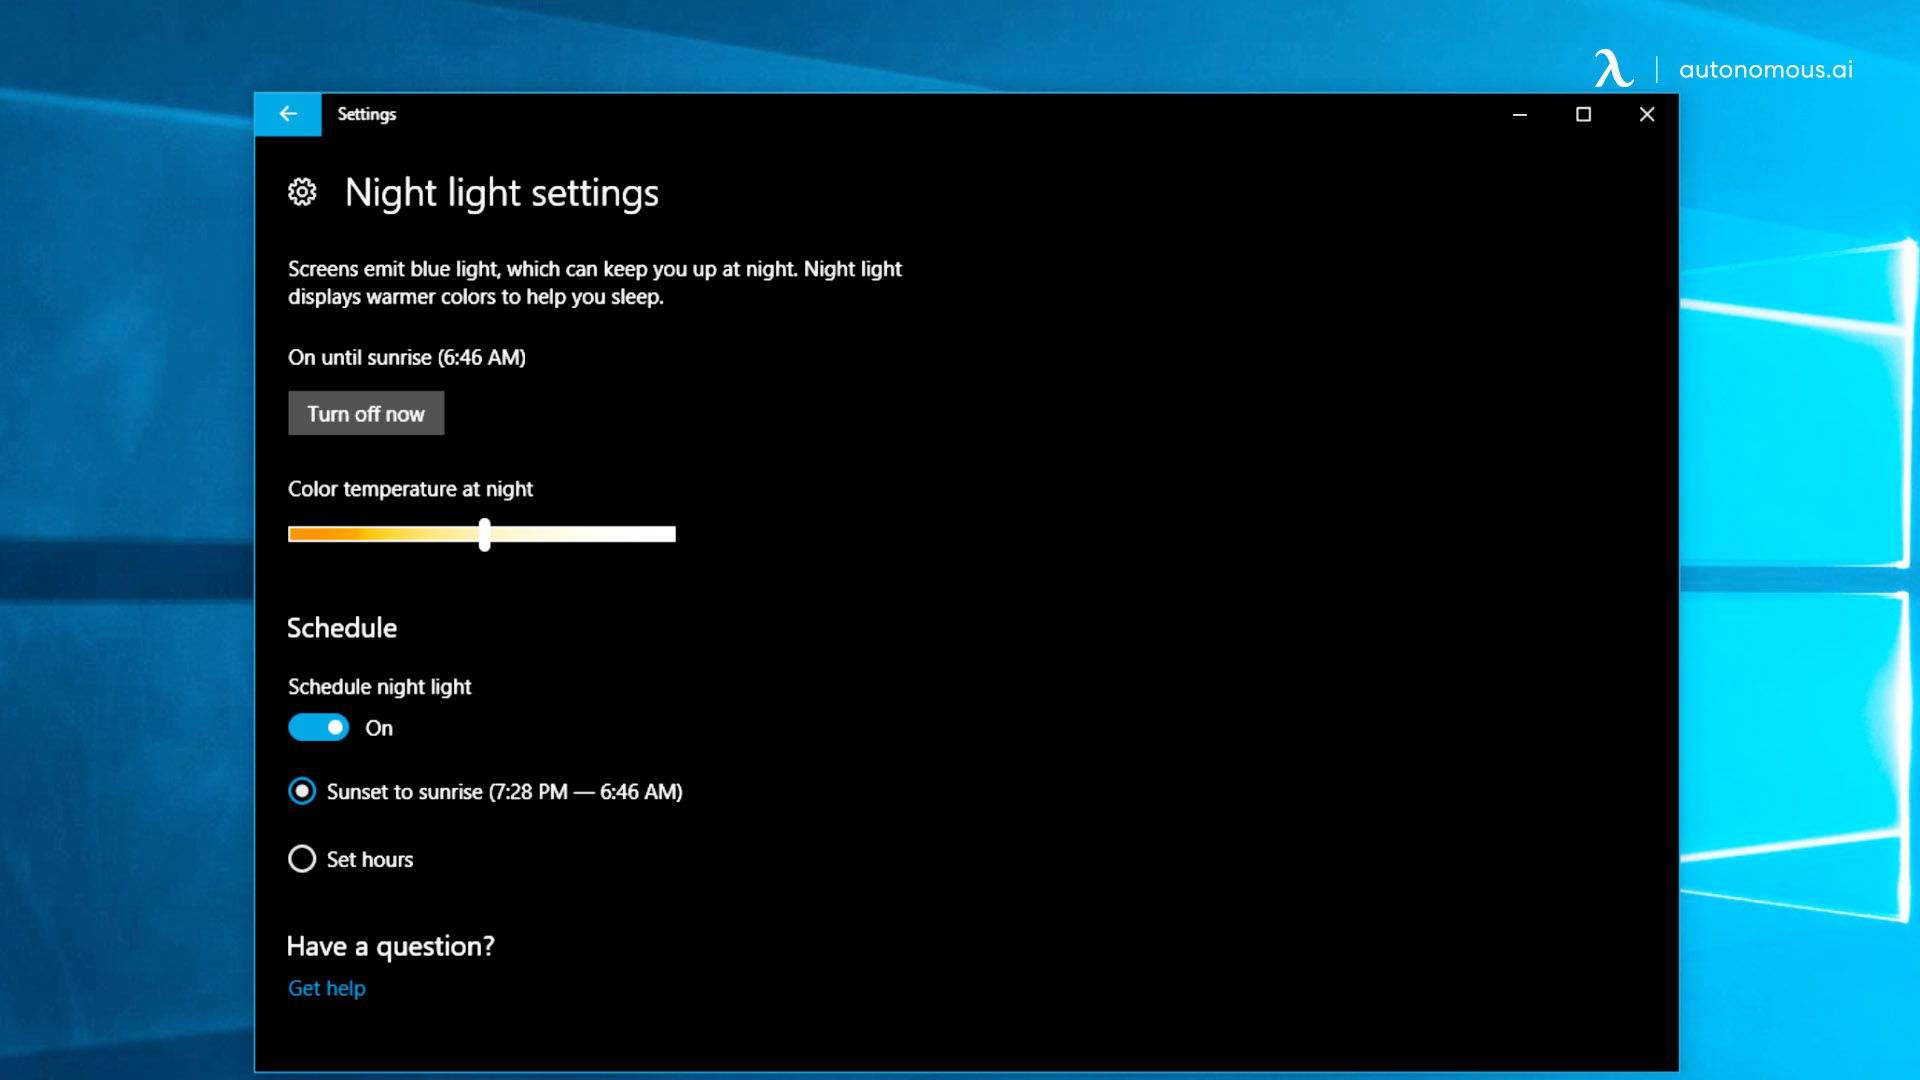 Adjust your screen settings